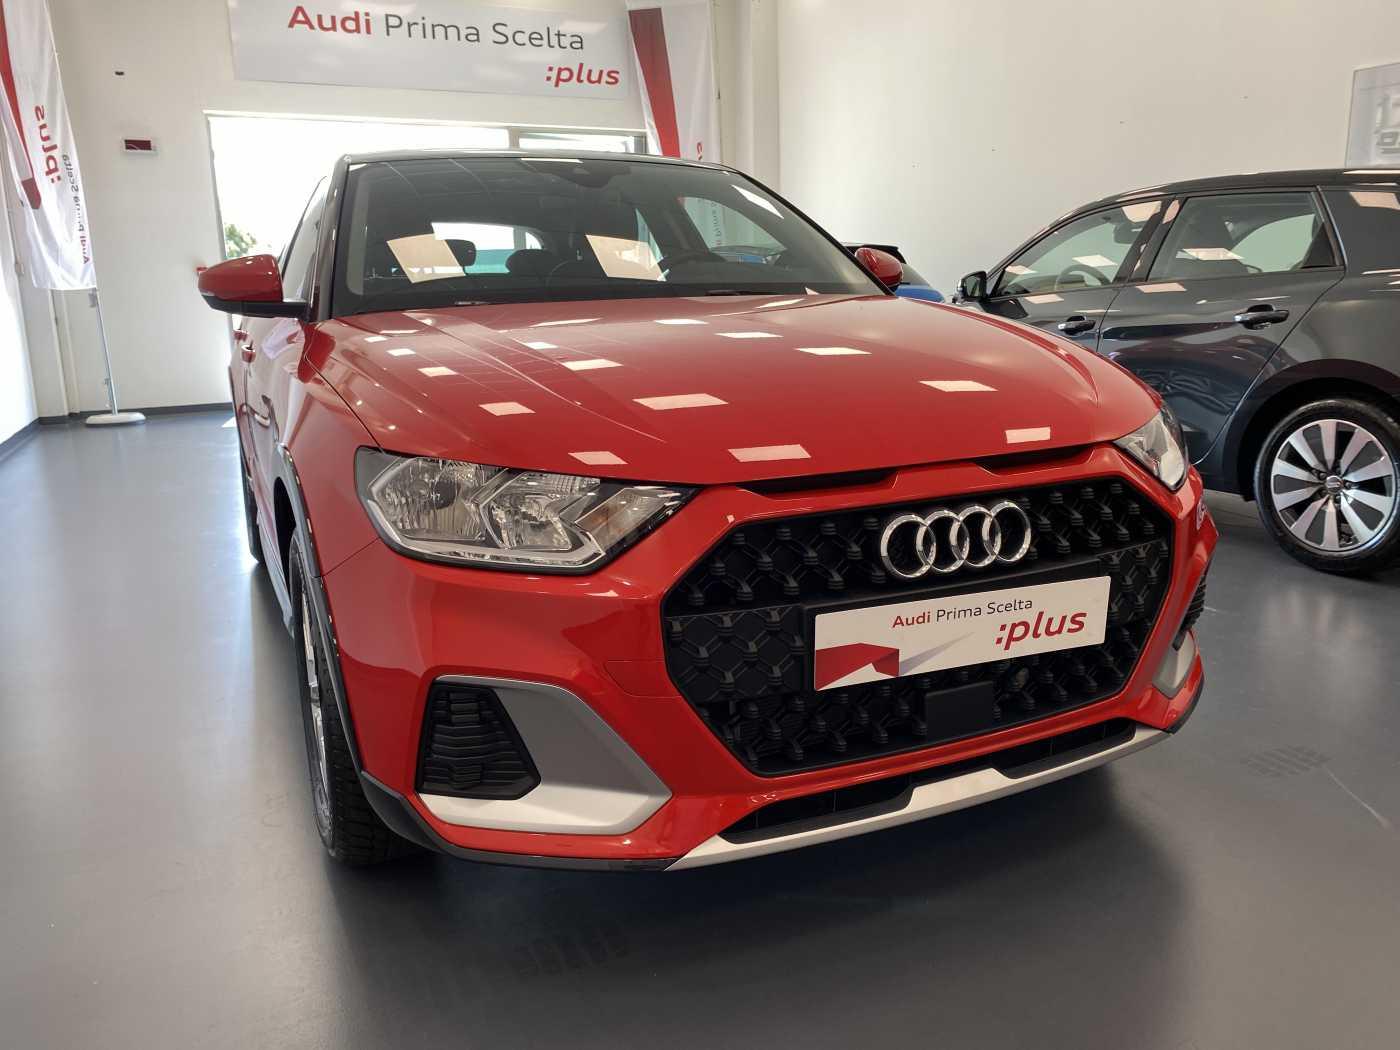 Audi - A1 2ª serie usata in Sardegna - Concessionaria ufficiale Audi Catte Auto Cagliari